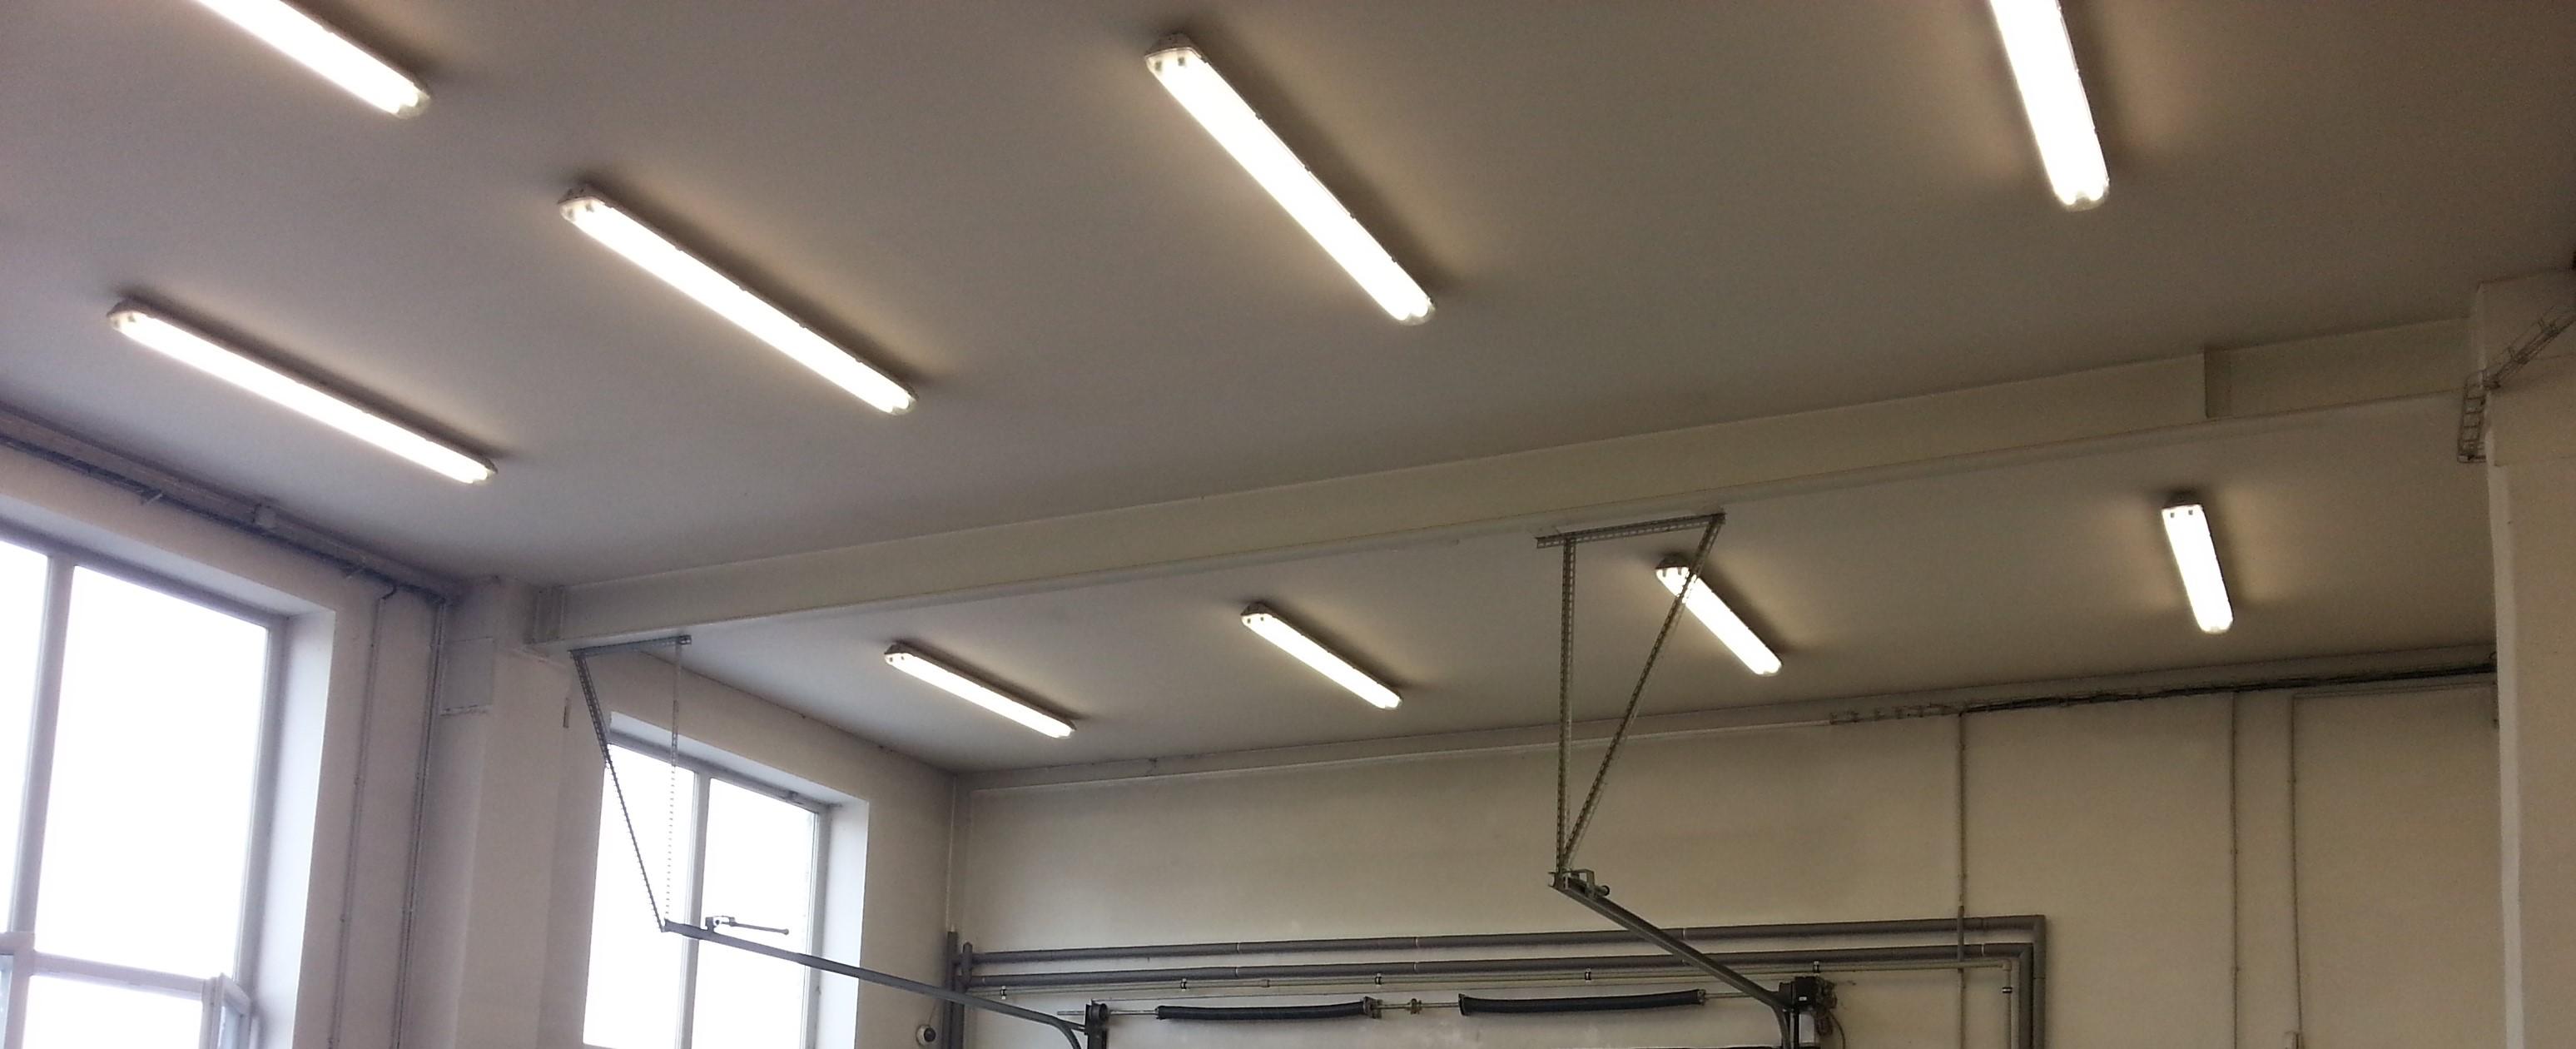 LED_svetla_zarivky_uspora_snadna_montaz